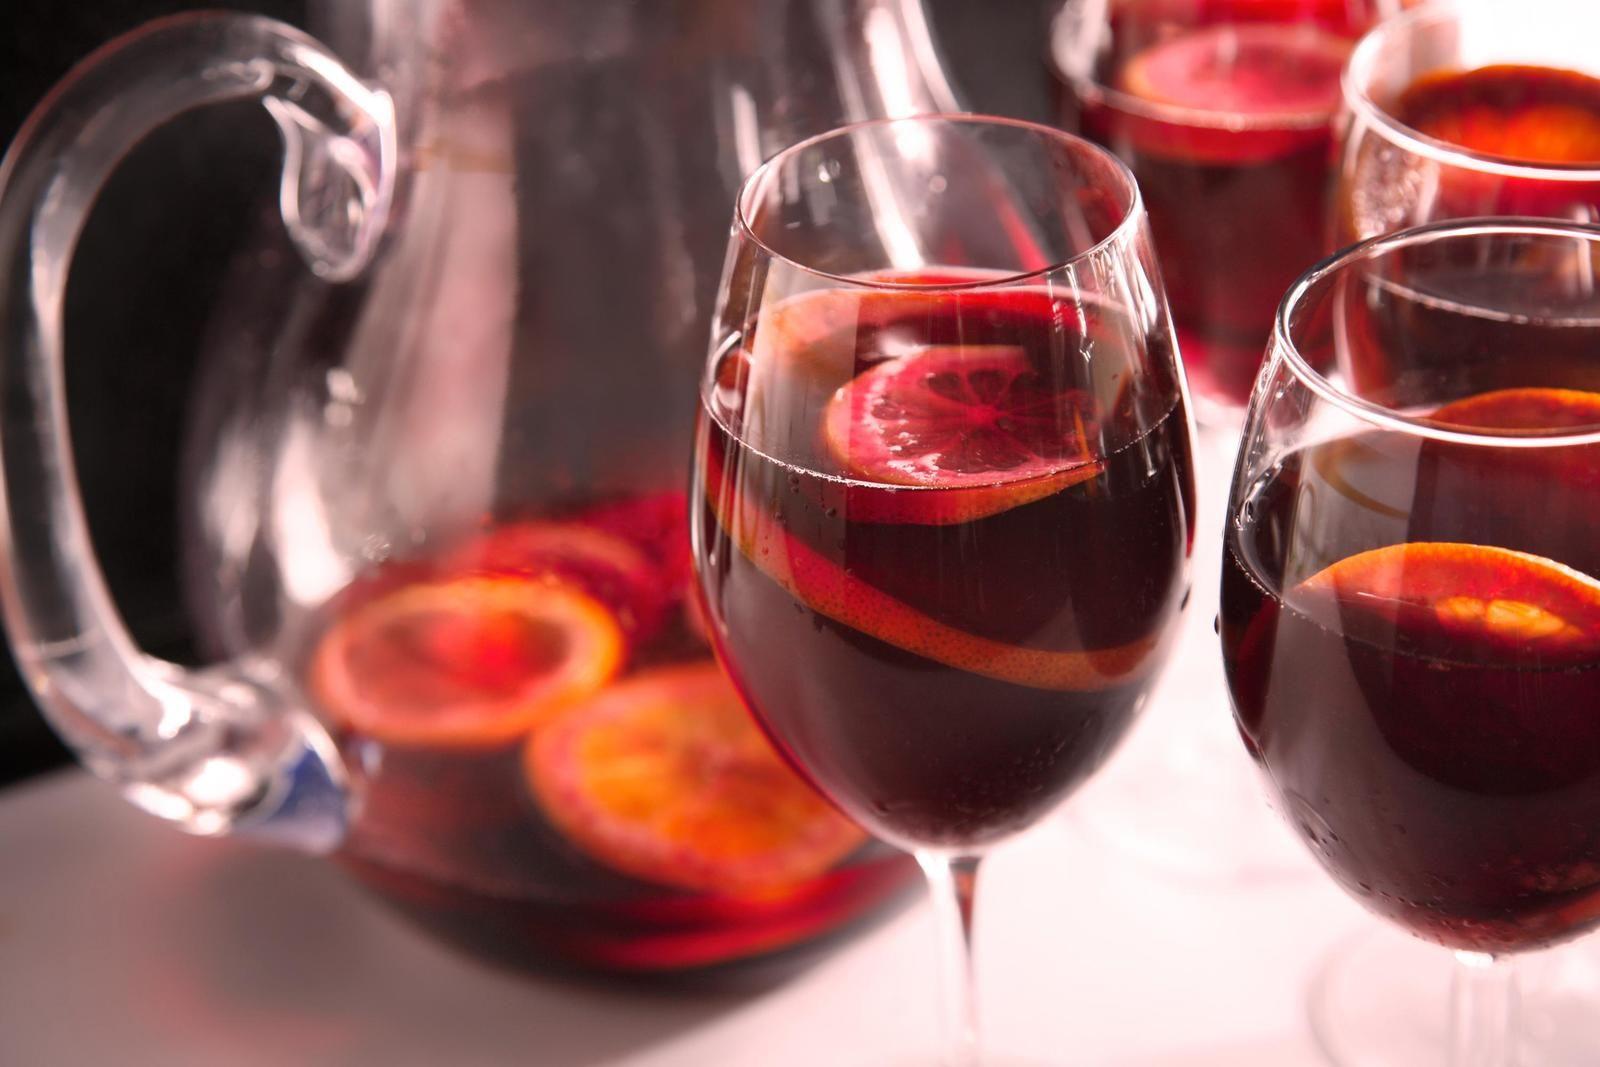 A Basic Sangria Made With Red Wine Brandy Citrus And Sparkling Water Sangria Recipes Cranberry Sangria Red Sangria